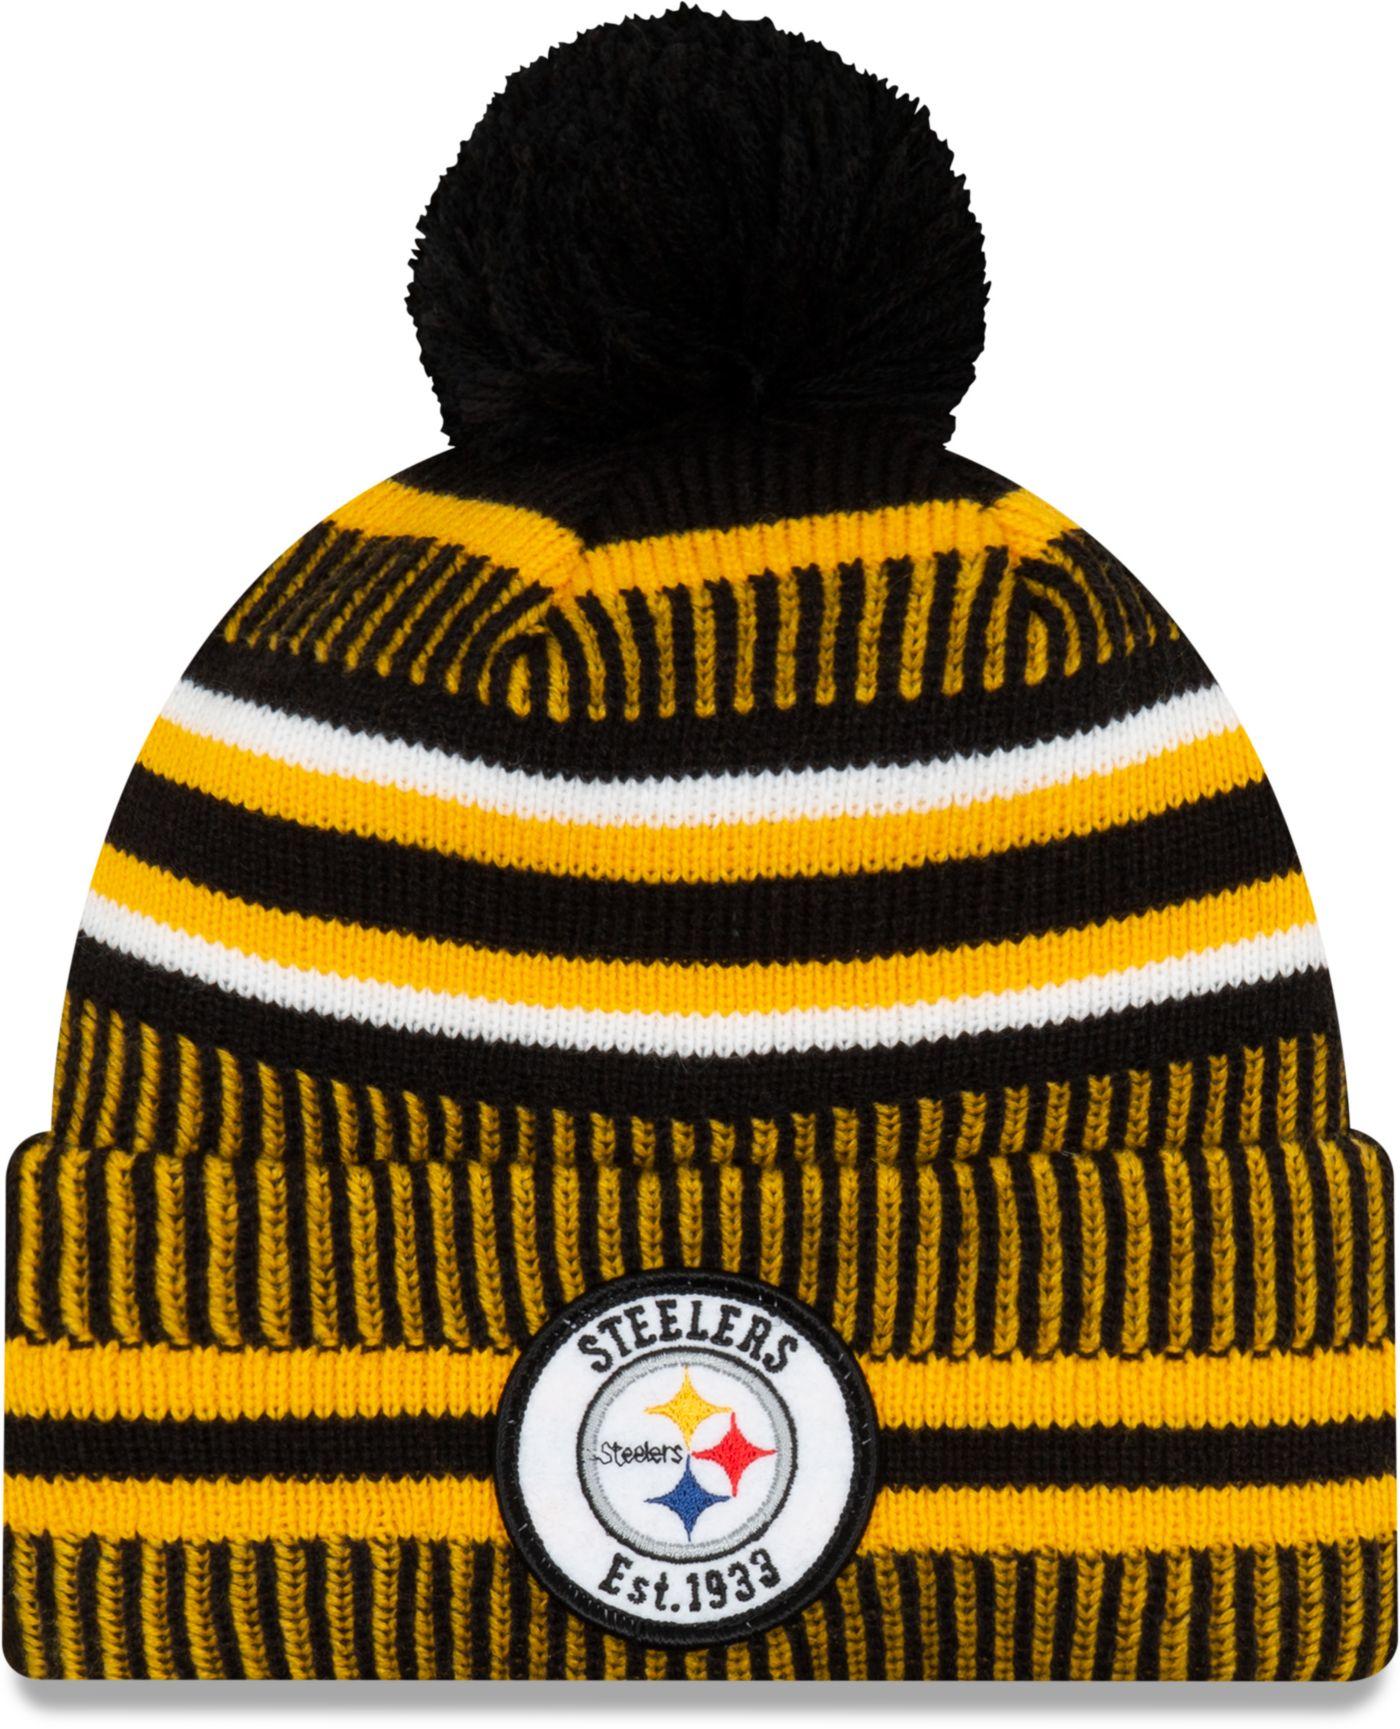 New Era Men's Pittsburgh Steelers Sideline Home Sport Pom Knit